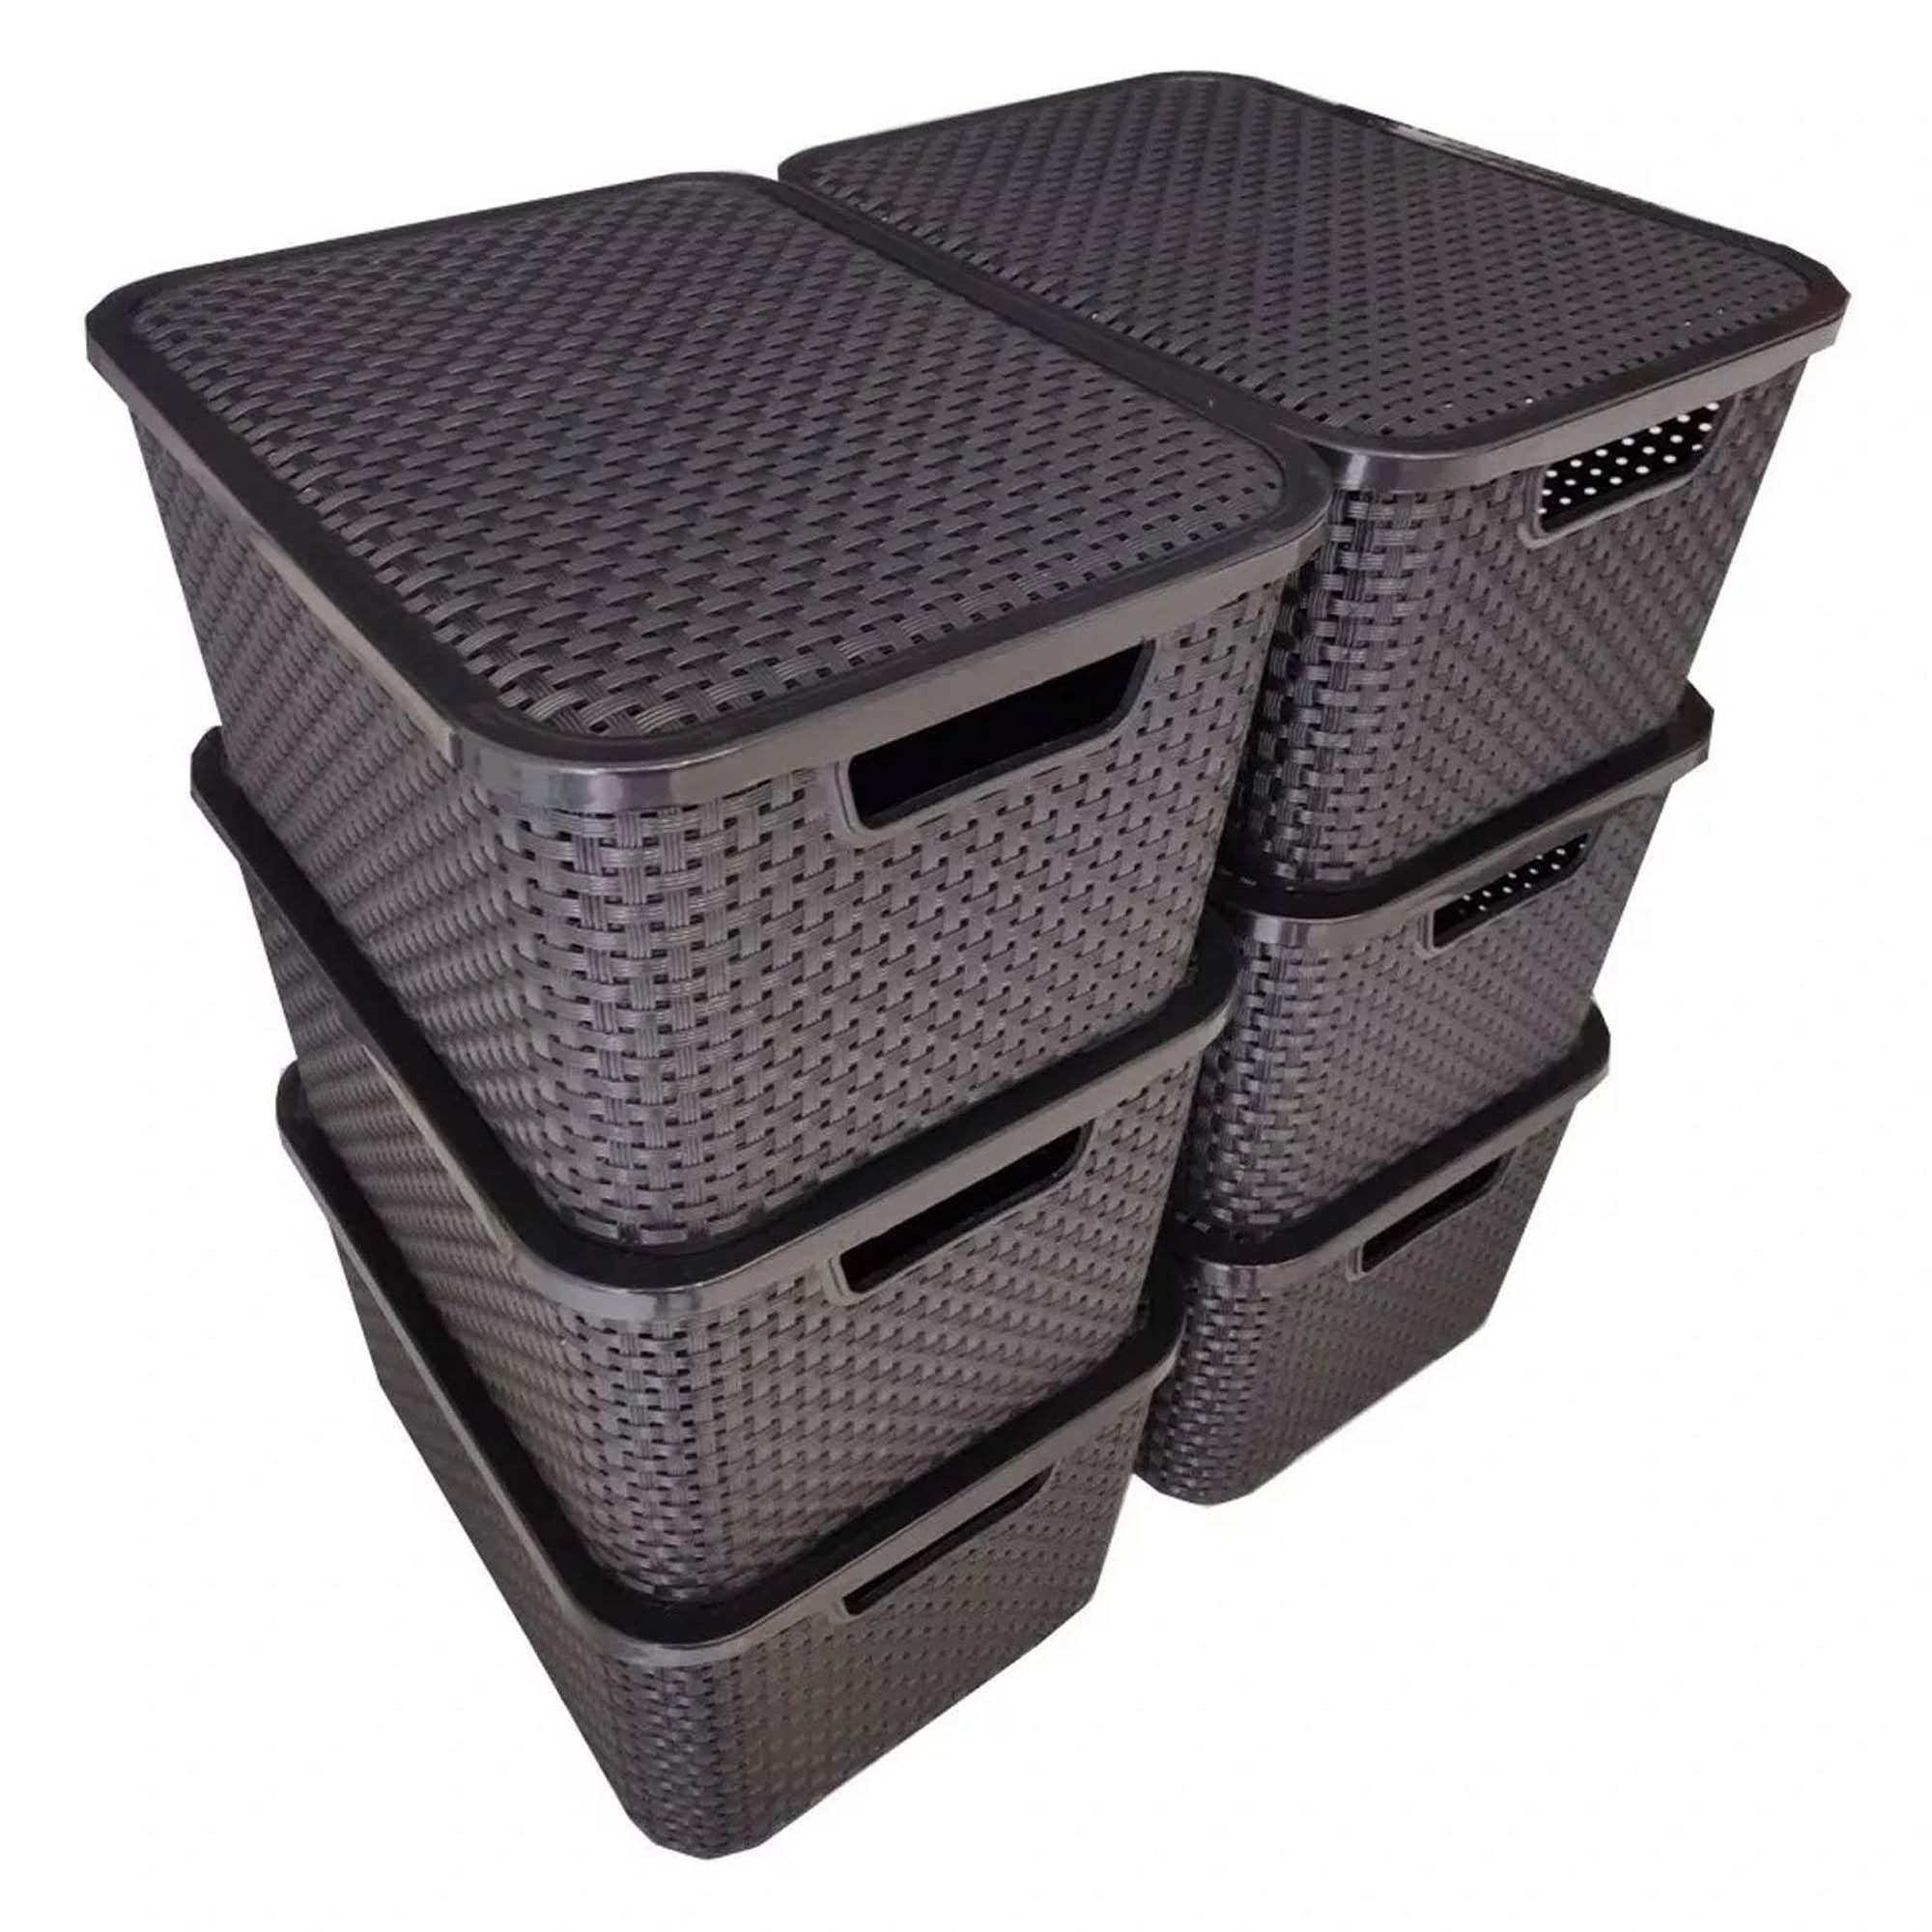 8 x Caixa Organizadora Plástica Cesto Rattan 20 L Com Tampa